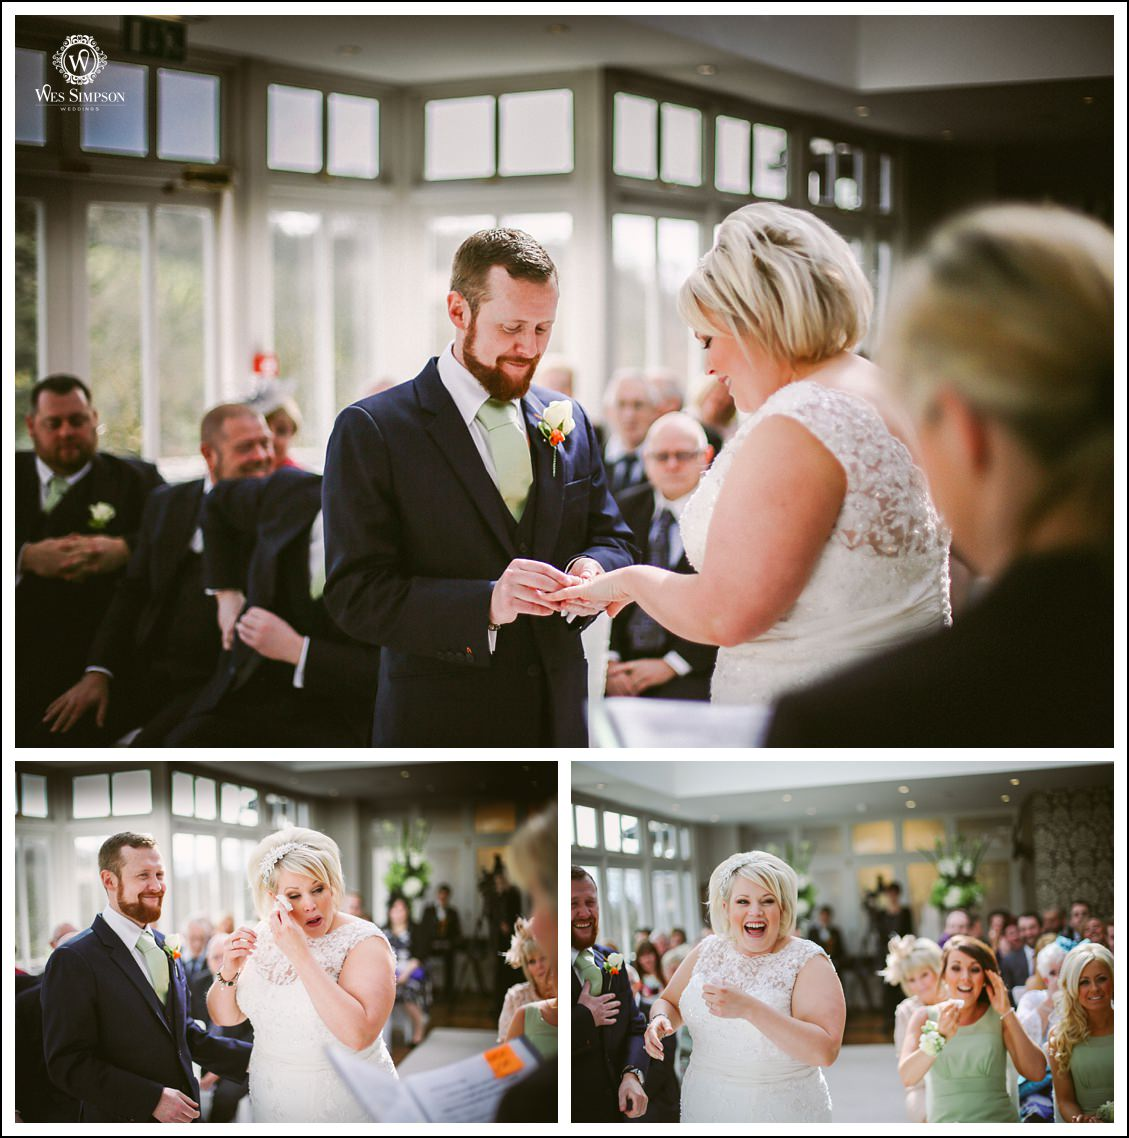 Broadoaks wedding venue, Lake District wedding photographer, Windermere, Wes Simpson photography_0035